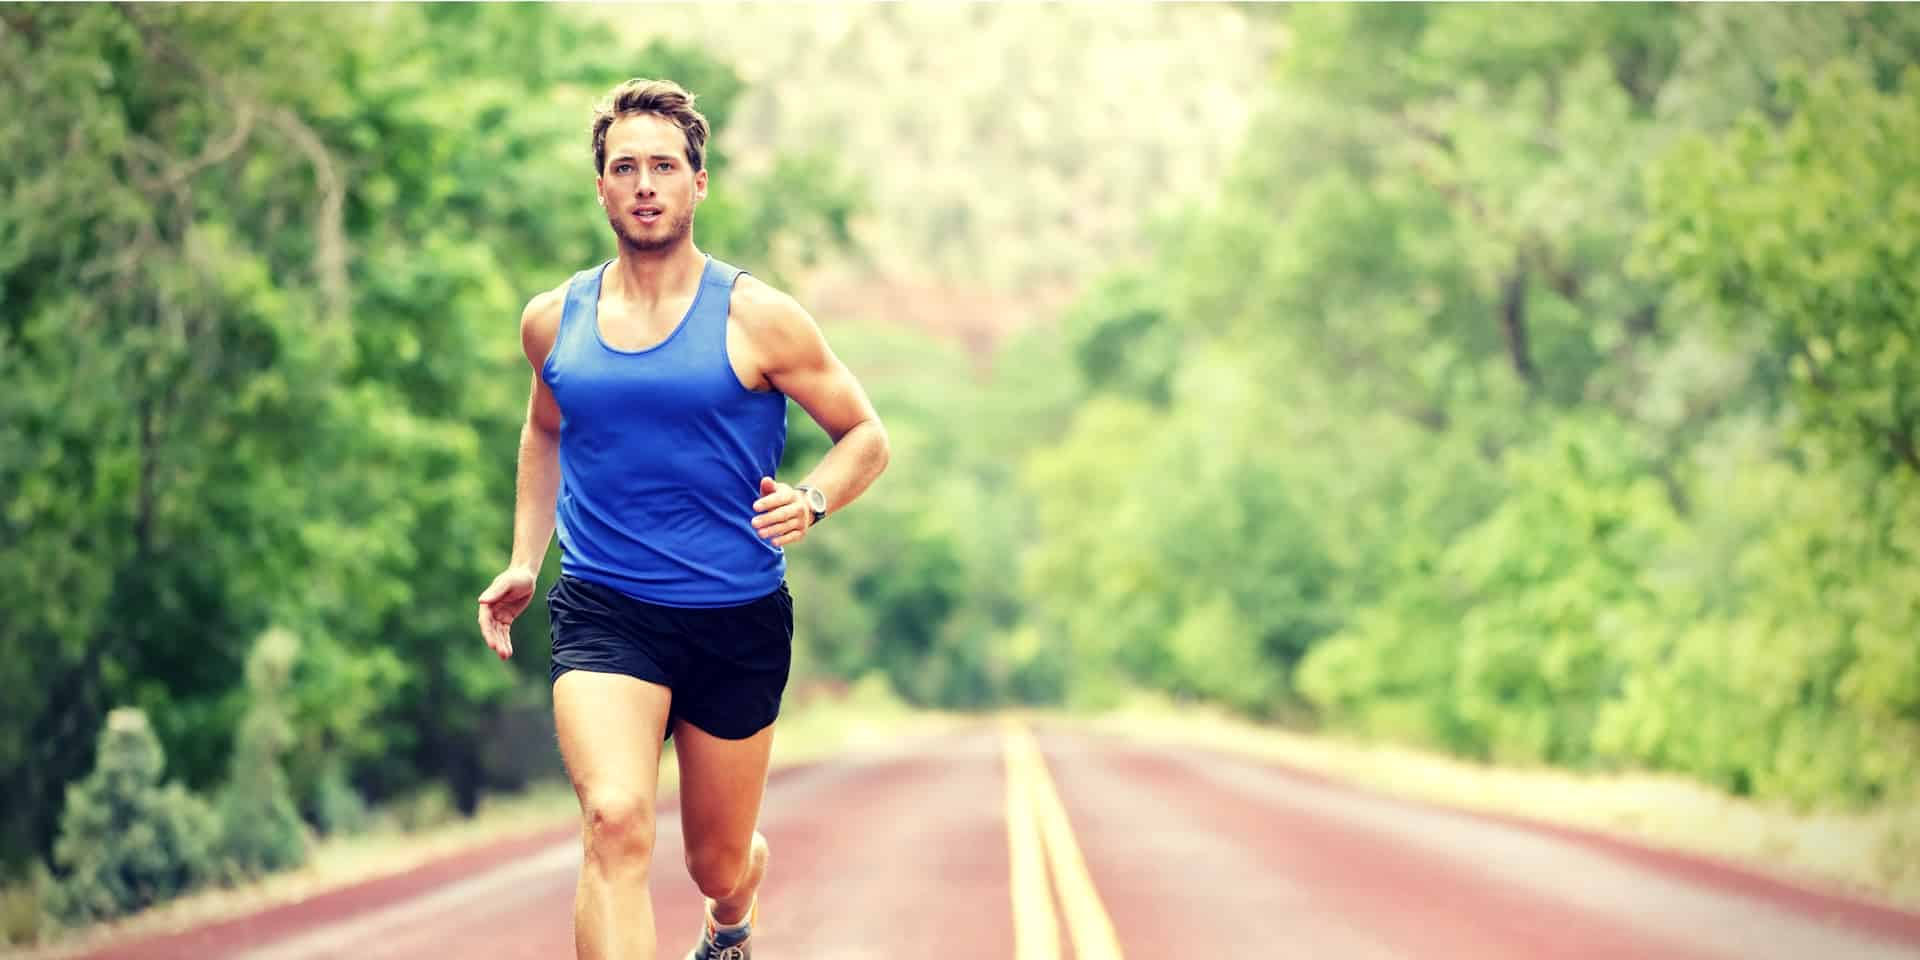 exogenous ketones Weight Loss endurance